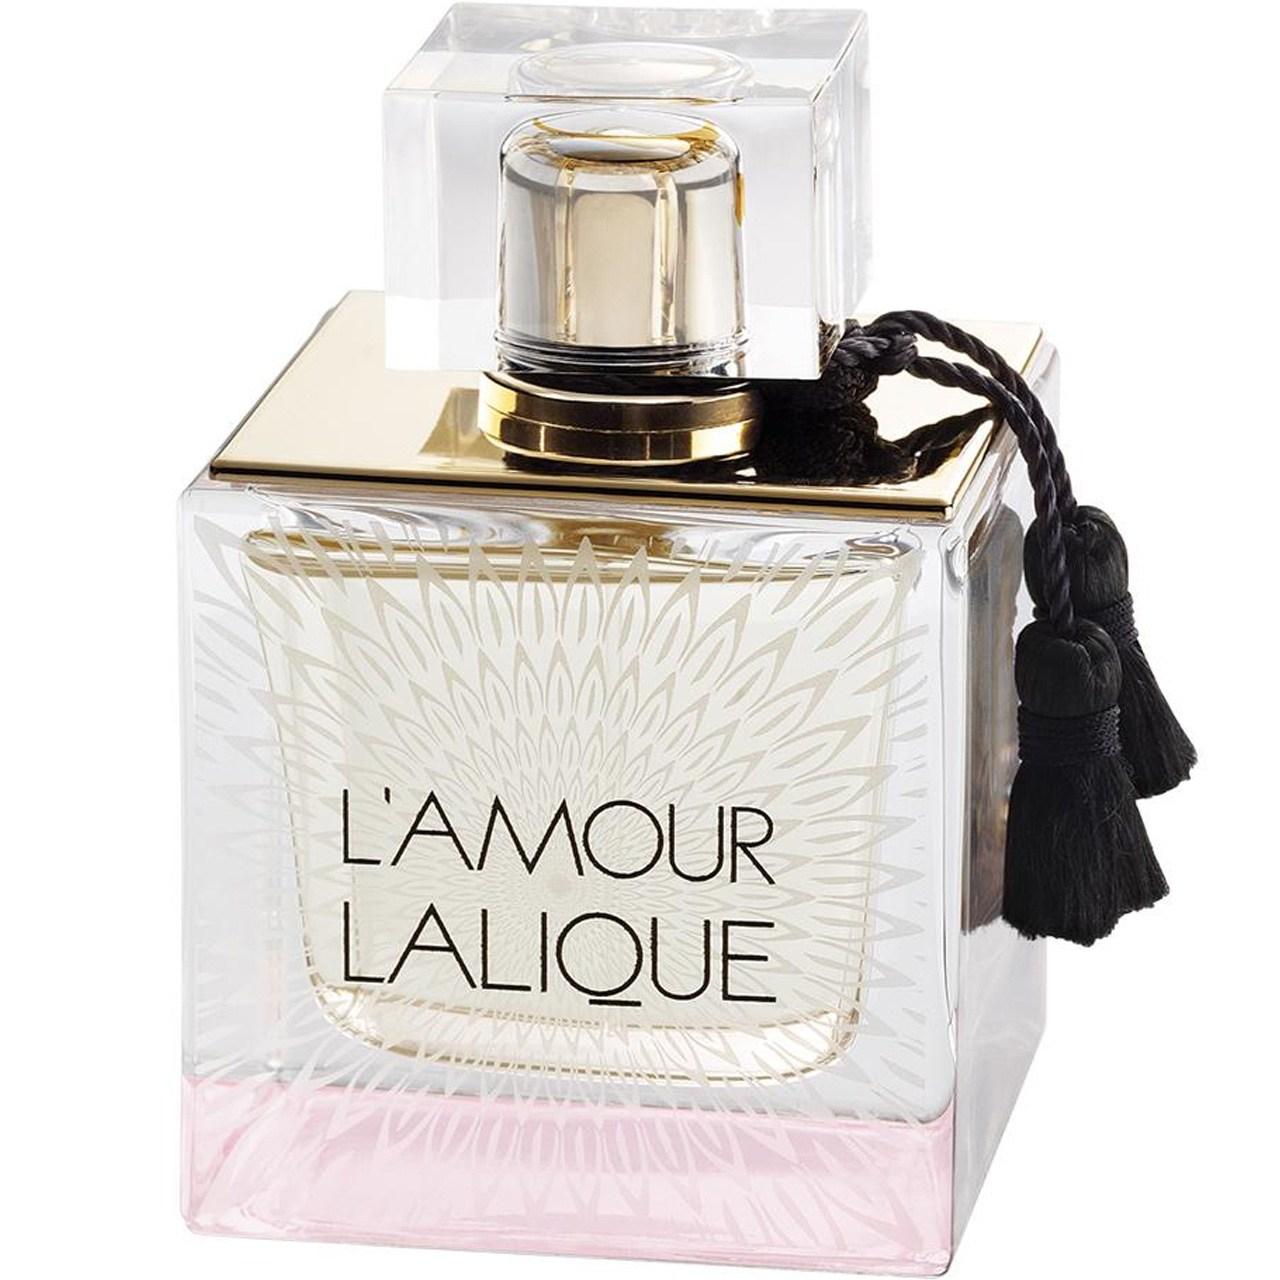 ادو پرفیوم زنانه لالیک مدل Le Amour حجم 100 میلی لیتر